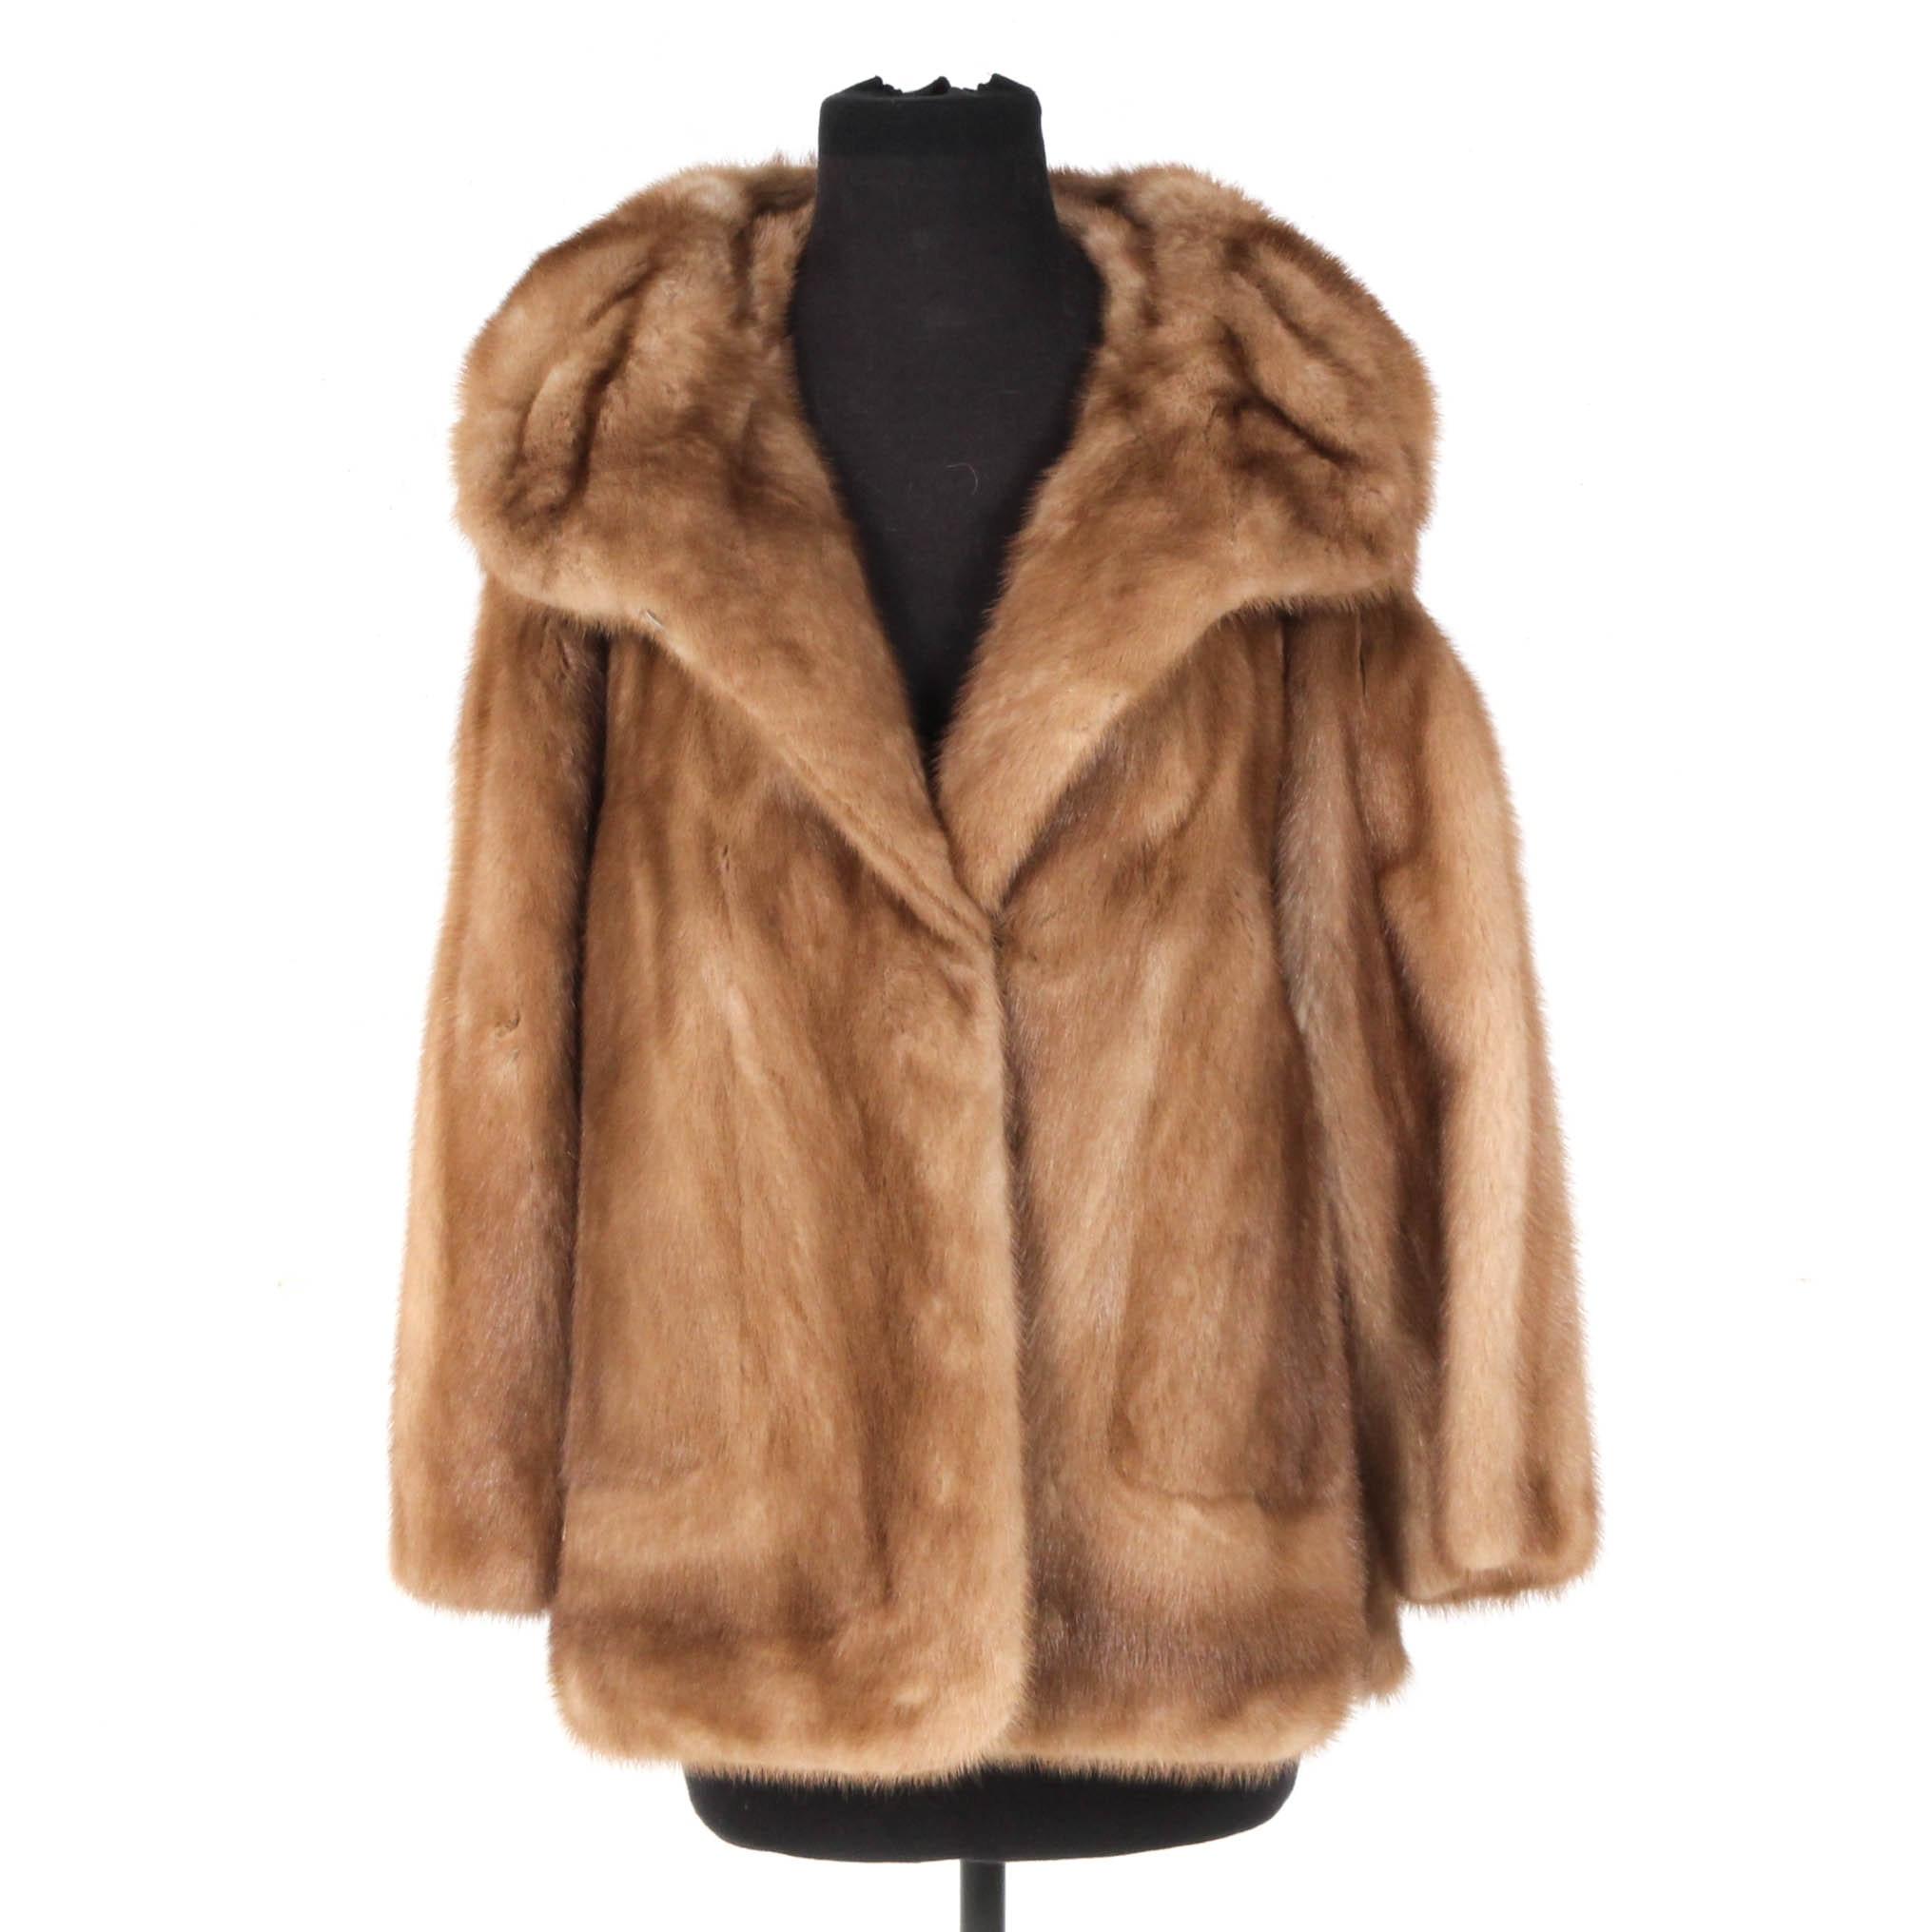 Vintage EMBA Mink Fur Coat